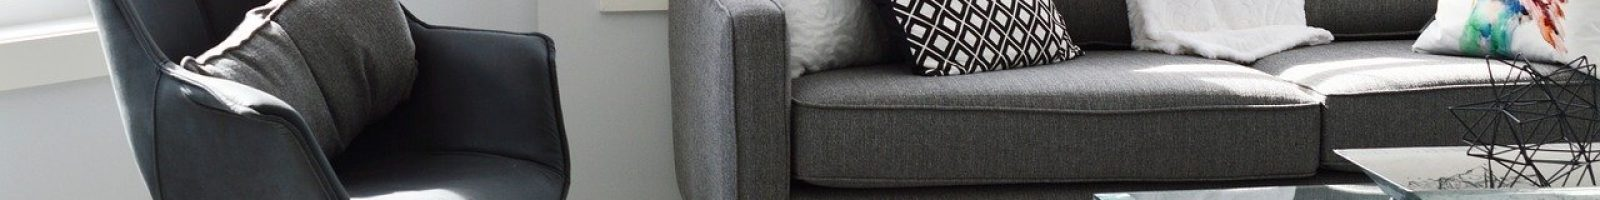 living room, chair, sofa